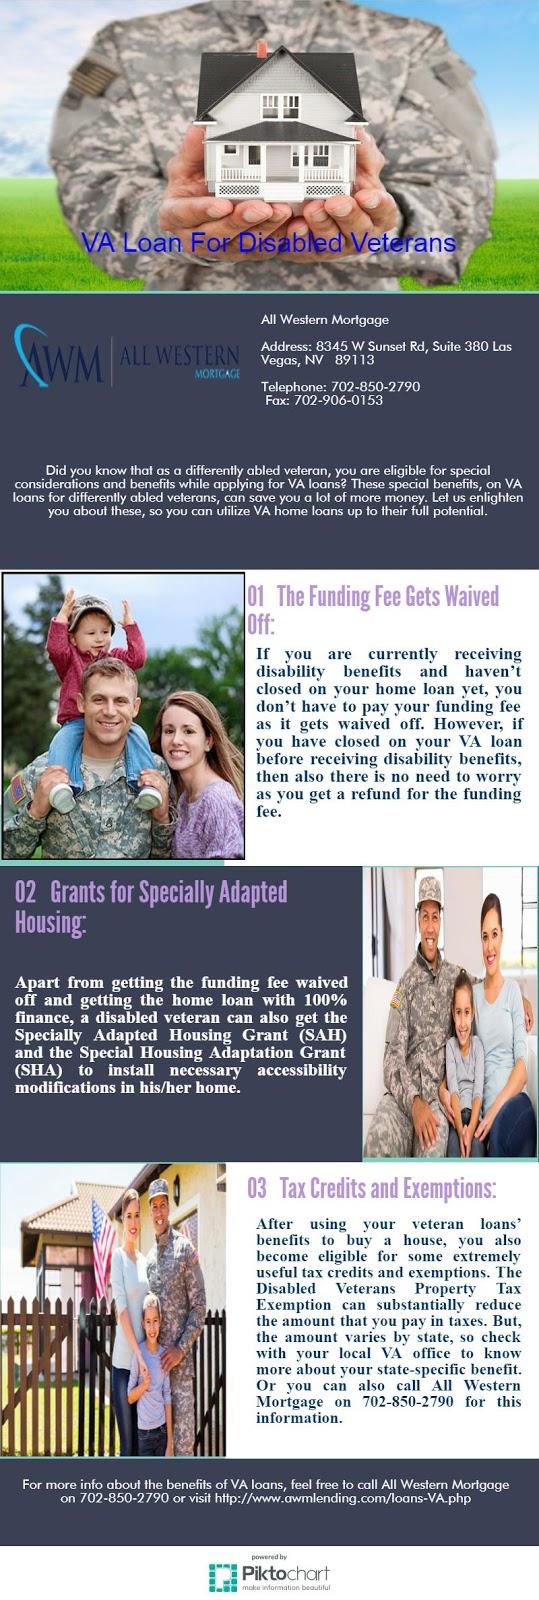 VA Loan For Disabled Veterans Infographic